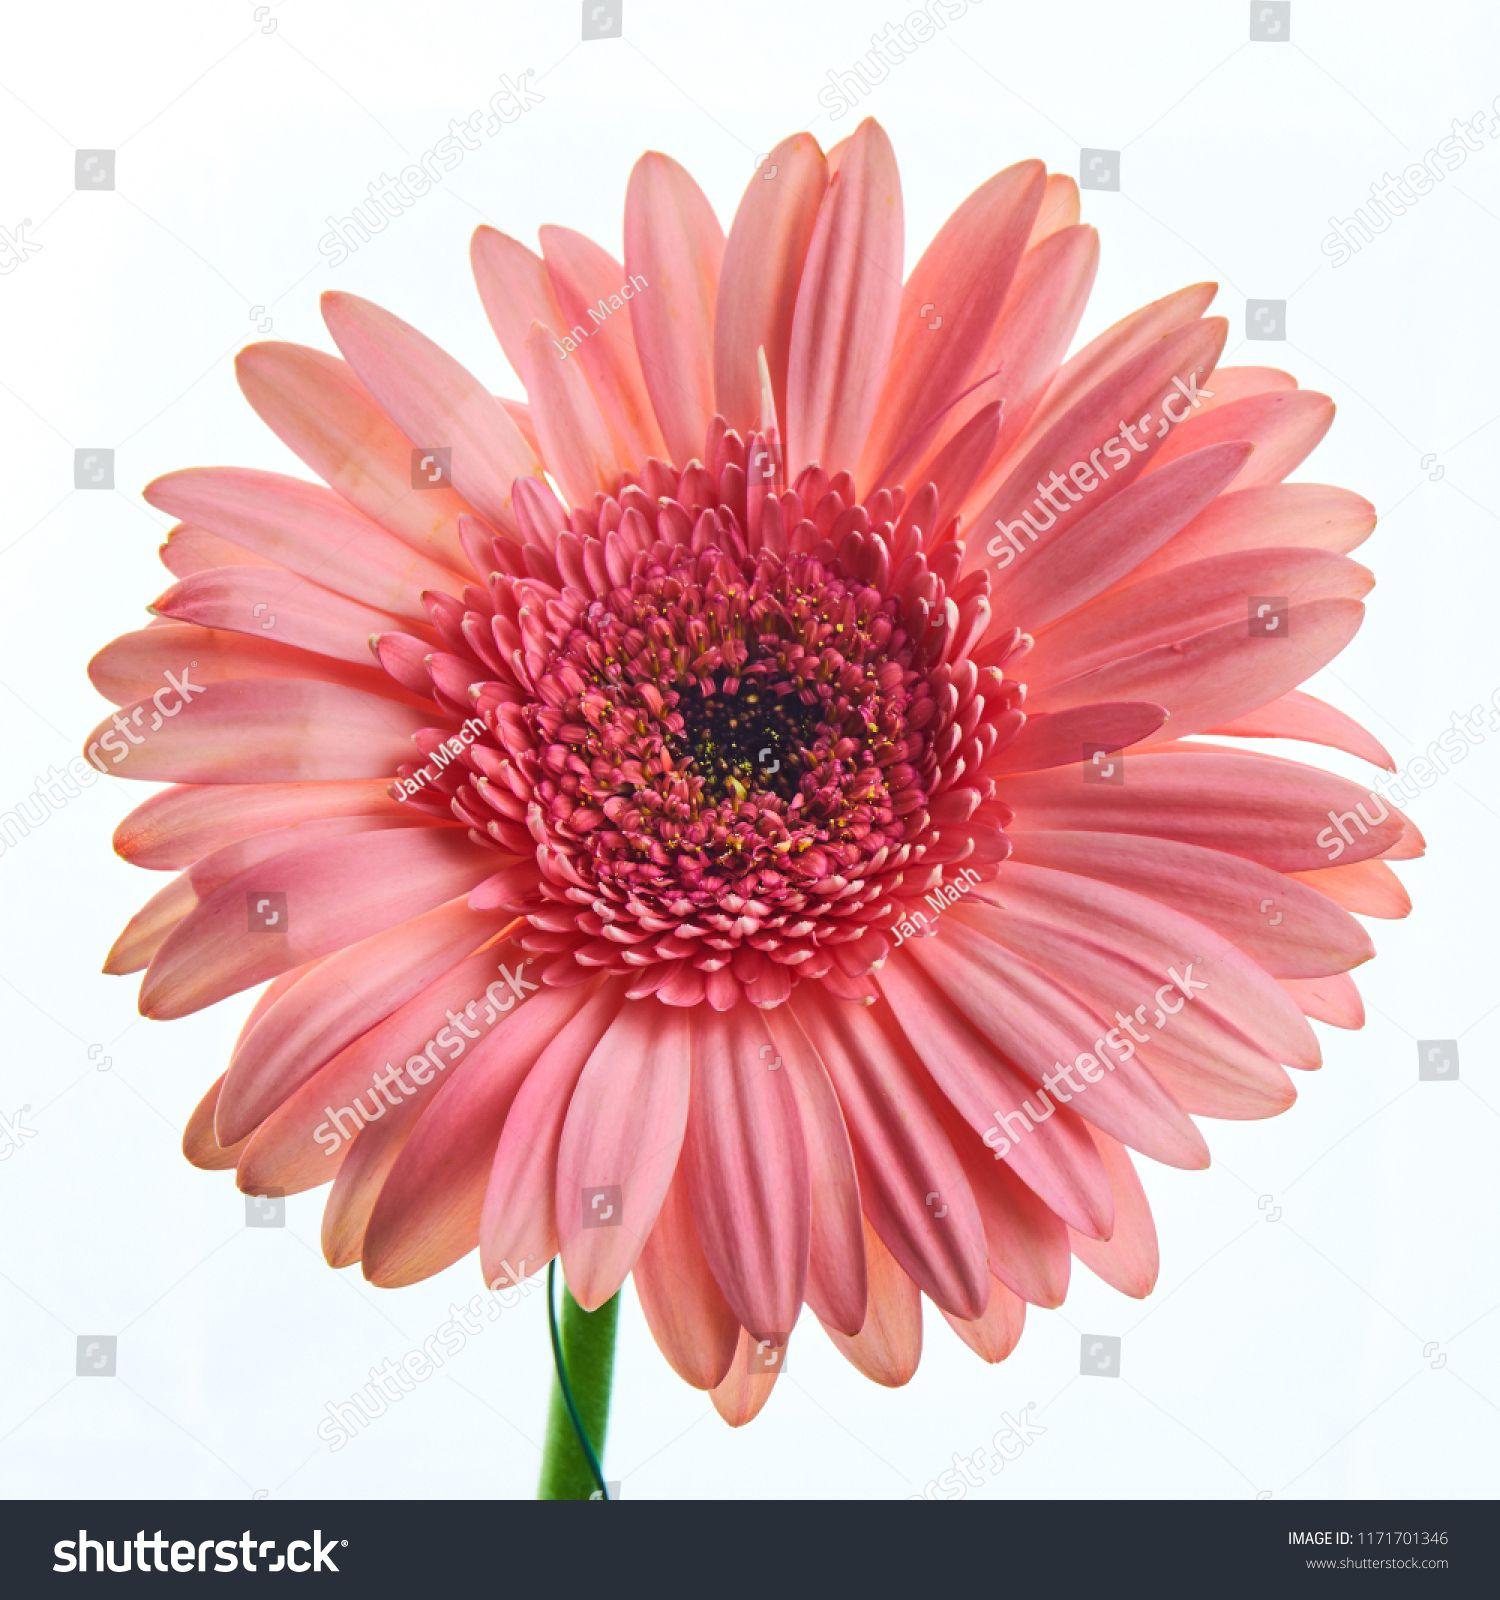 Beautiful Pink Gerbera Flower On White Background Gerbera Flower Pink Gerbera